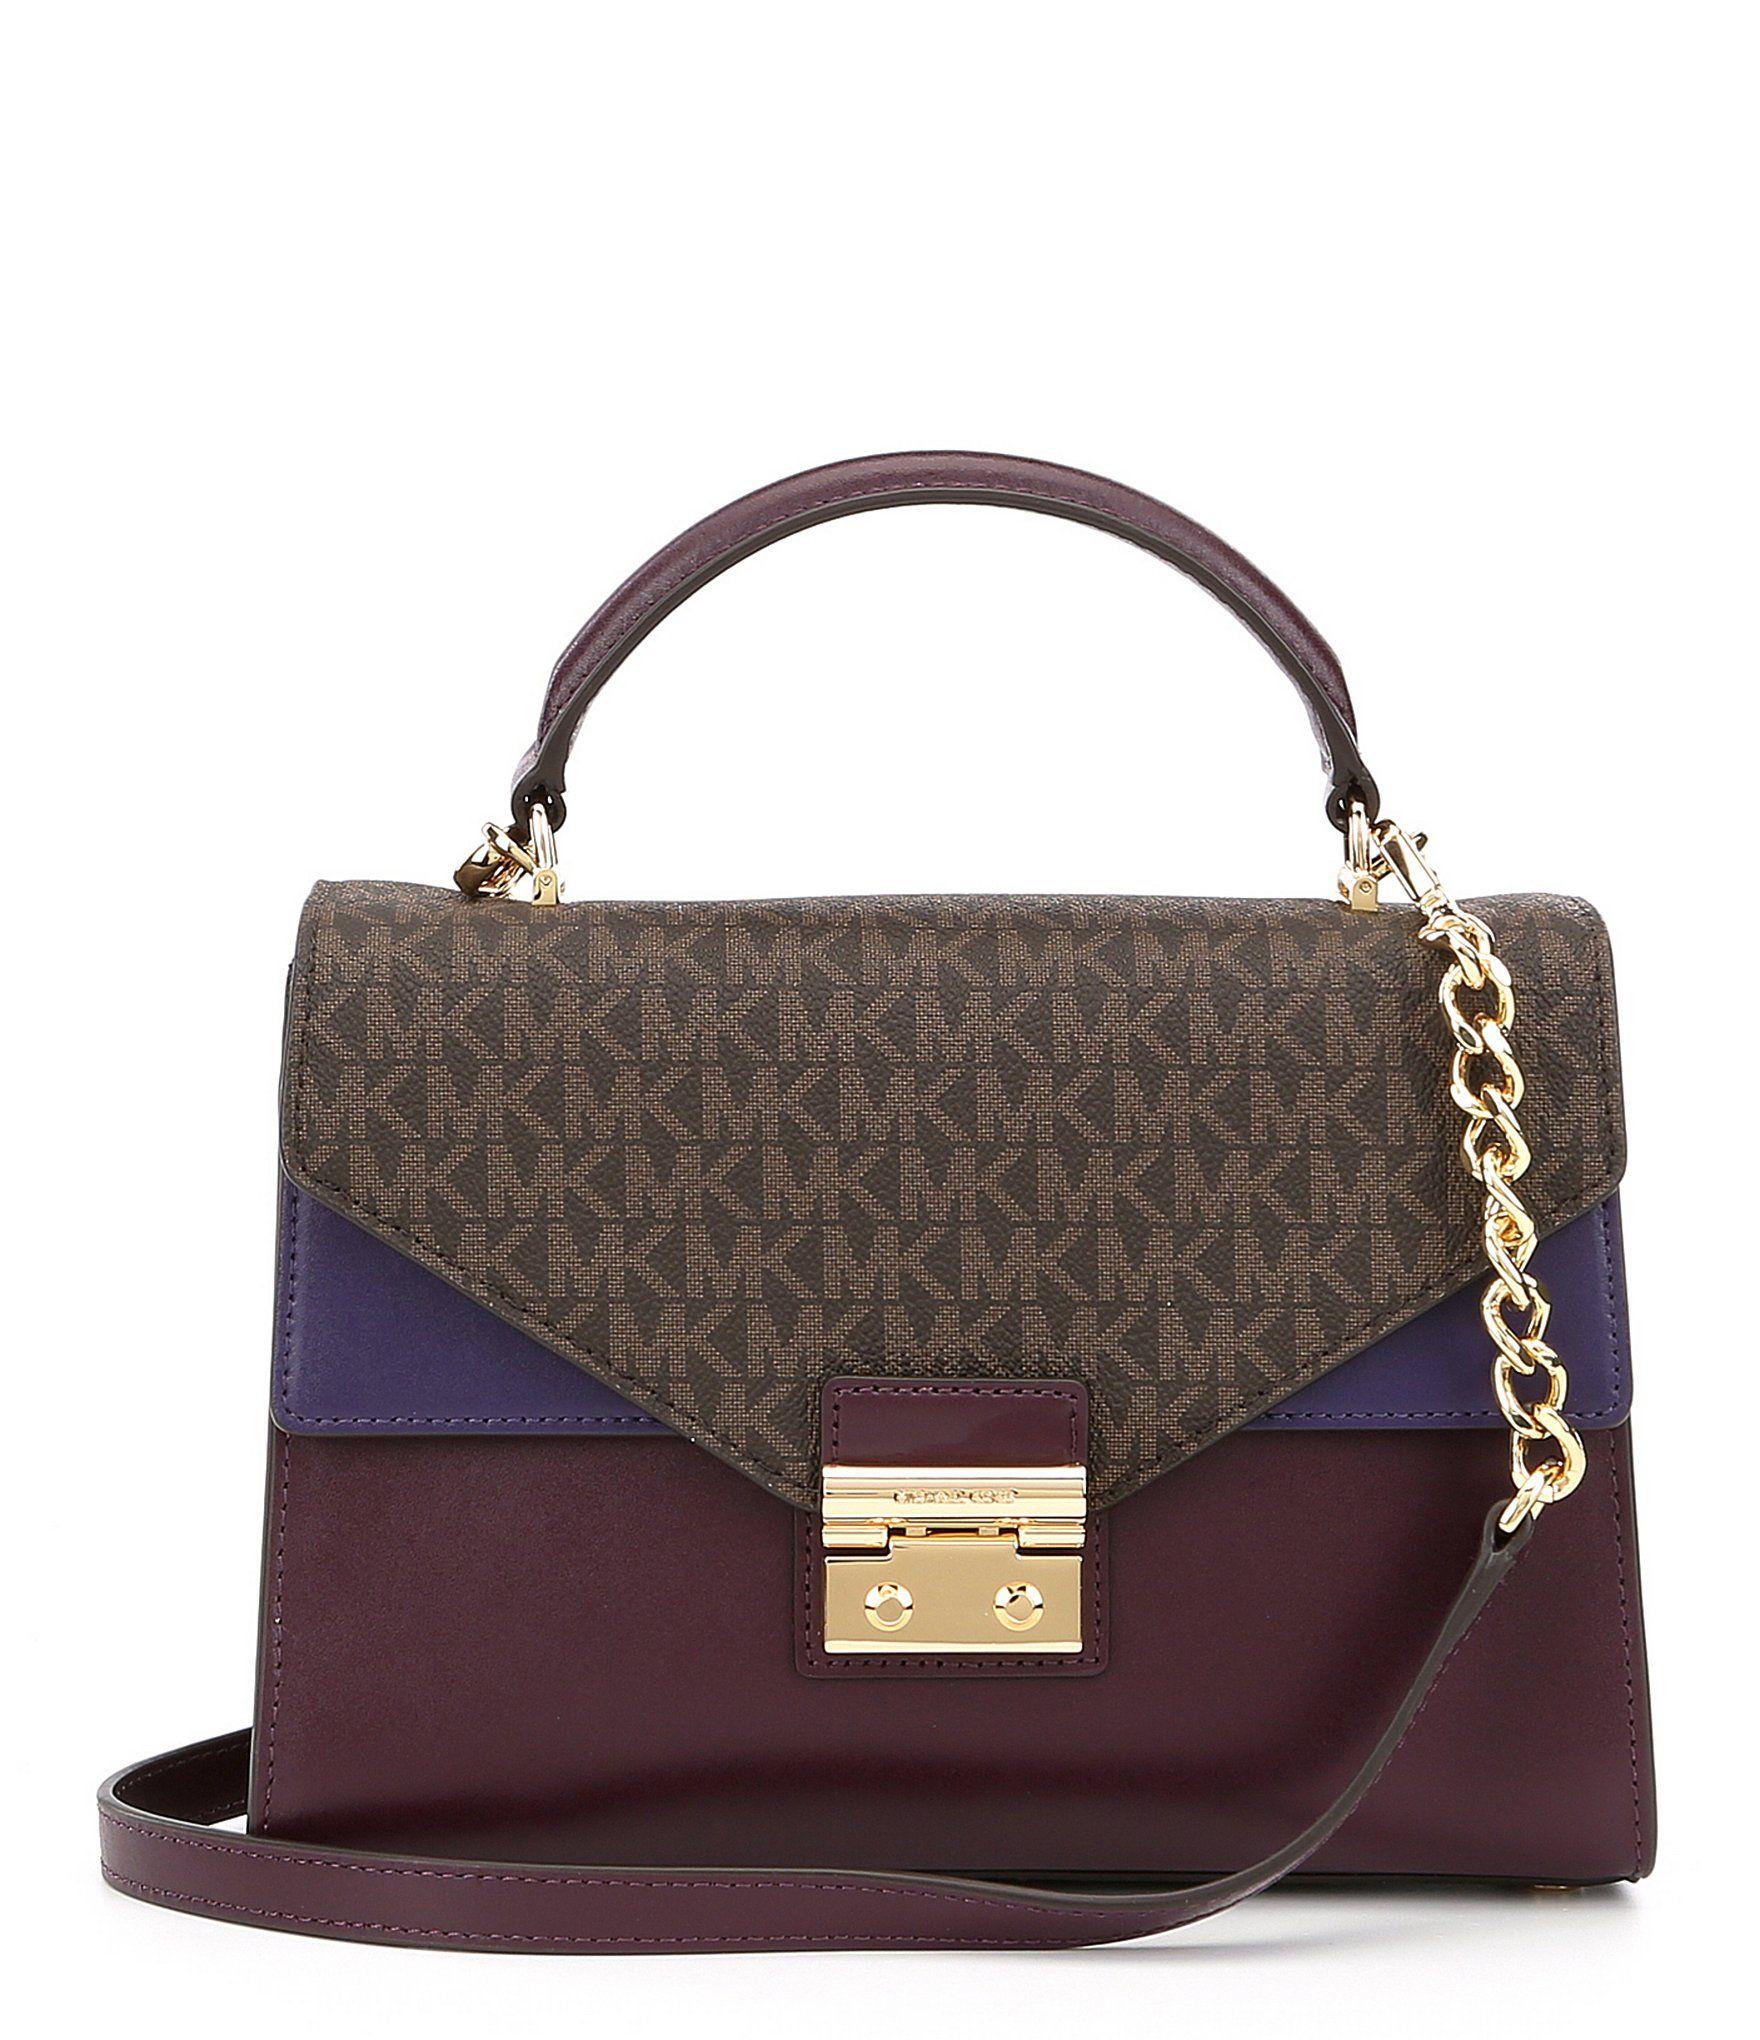 23eaaa23daae ... handbags 3dfe5 32827; coupon for michael michael kors sloan ab211 dbd78